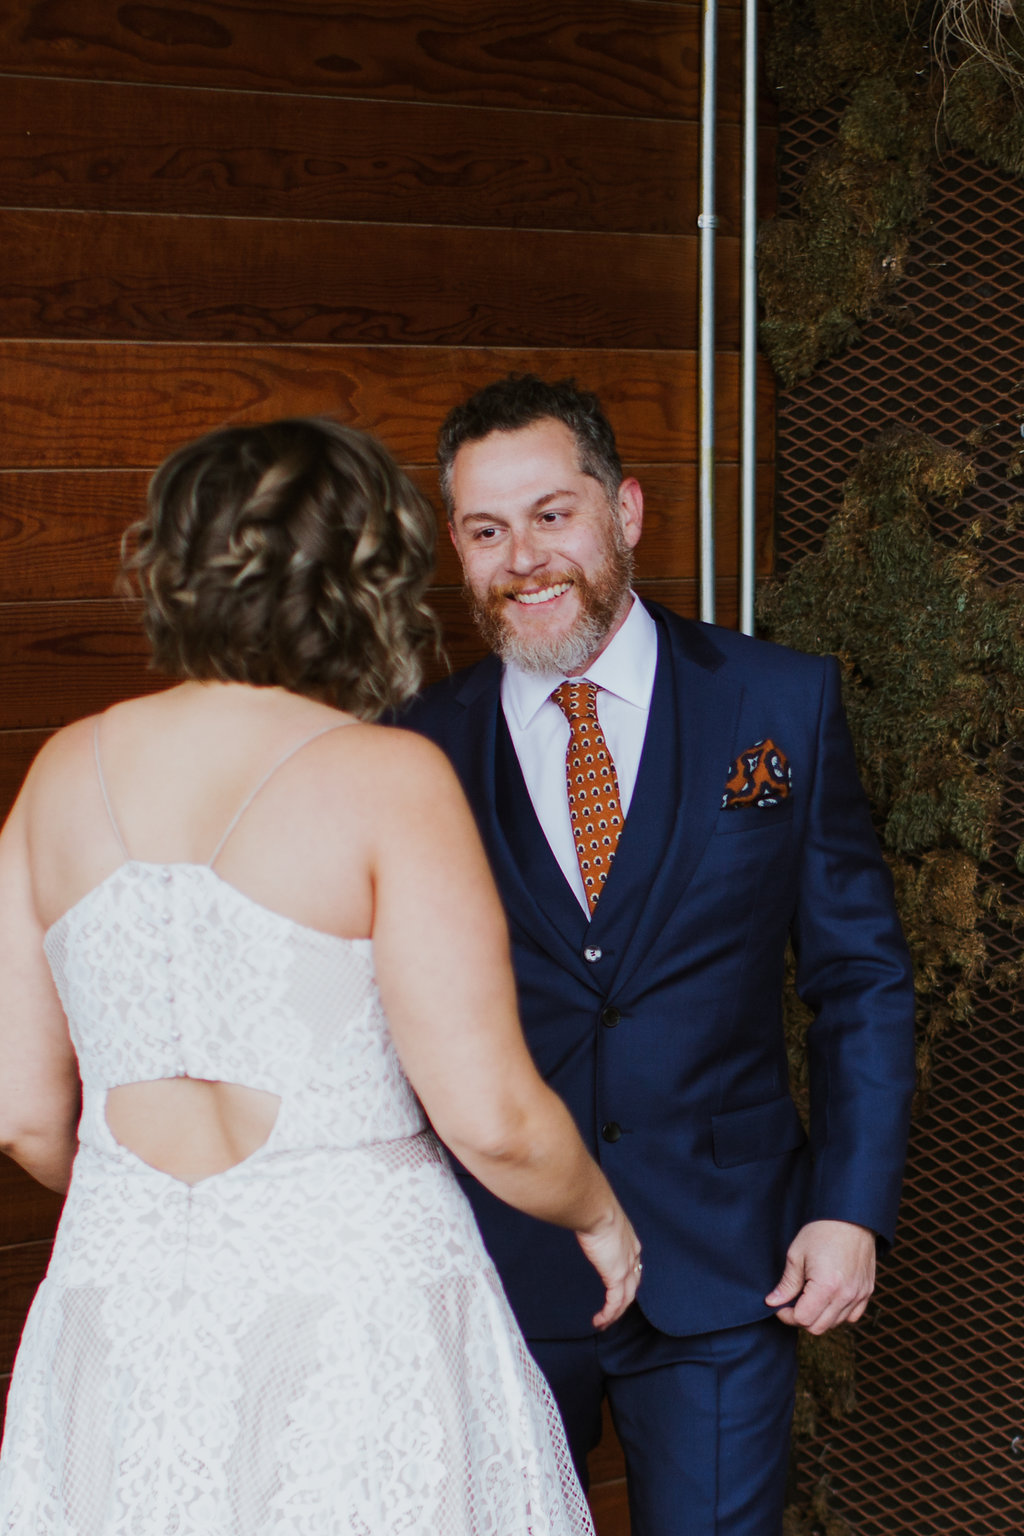 Paige-Newton-Intimate-Wedding-Photographer-Malverde-Wedding-Photography0020.jpg